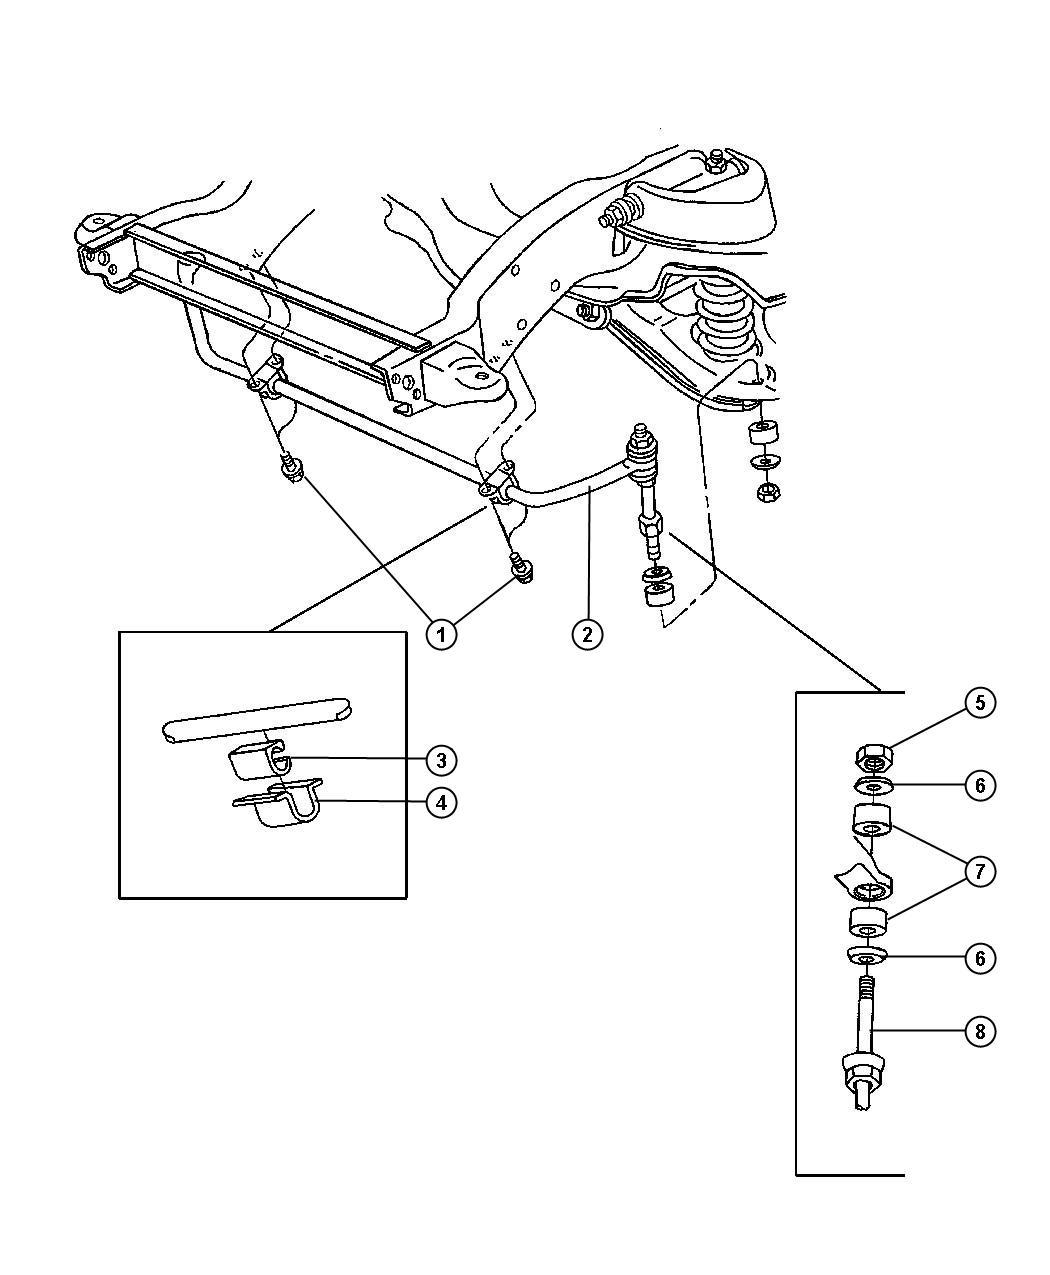 Chrysler Pt Cruiser Bolt Used For Screw And Washer